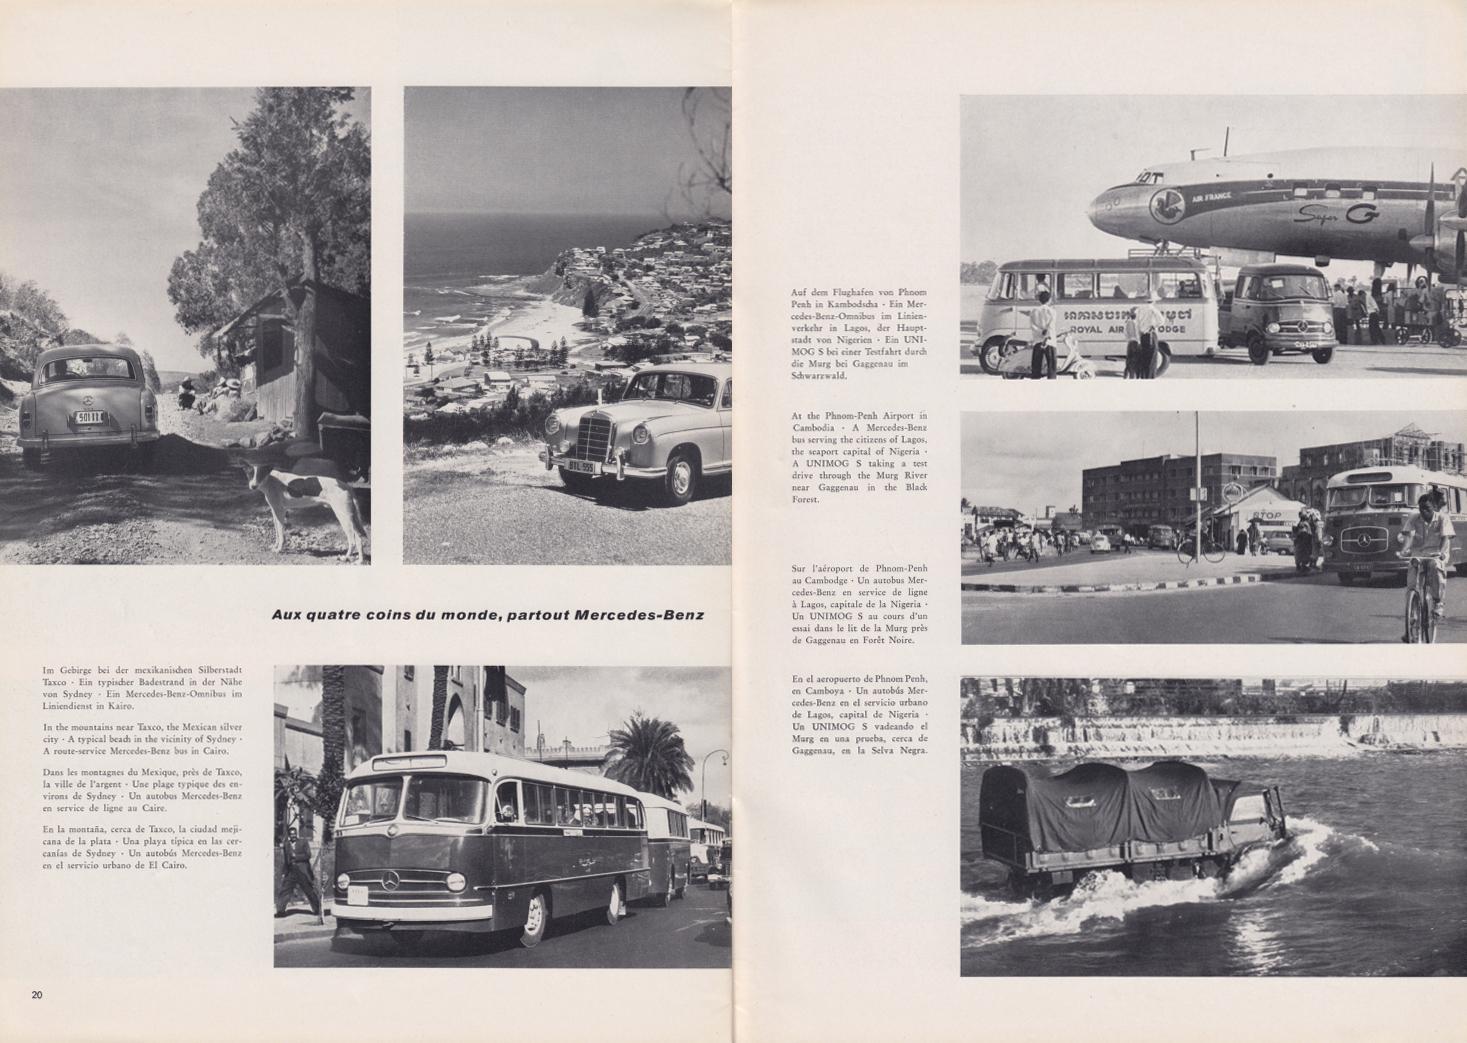 (REVISTA): Periódico In aller welt n.º 32 - Mercedes-Benz no mundo - 1959 - multilingue 011